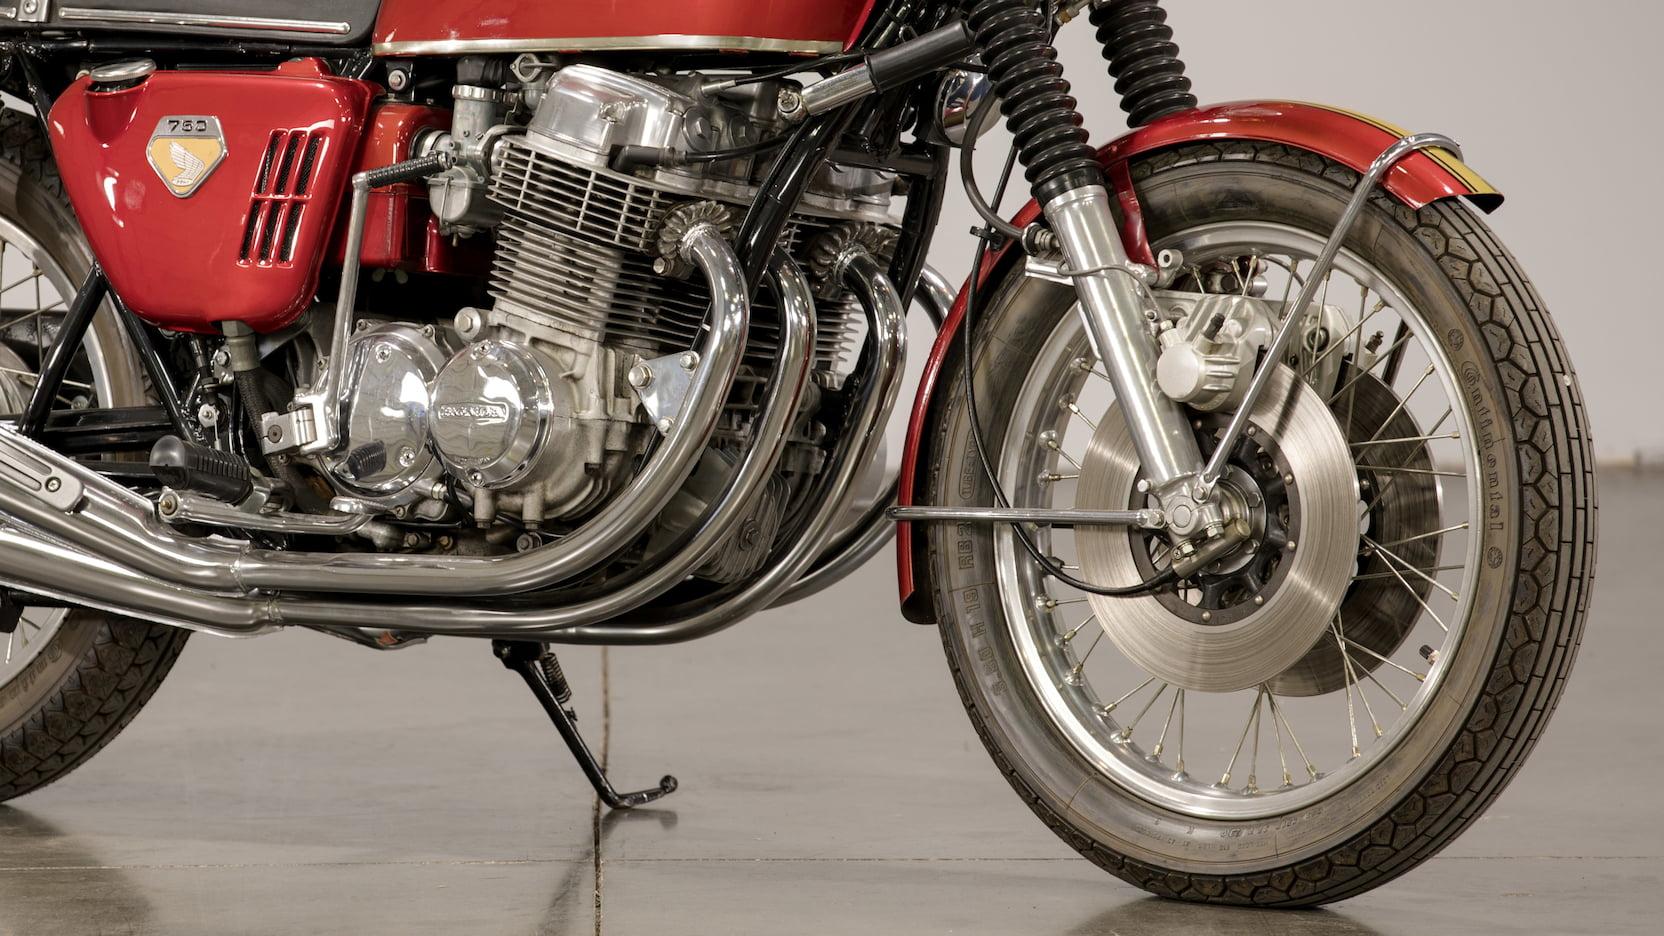 1969 Honda CB750 Sandcast Lower Front Close